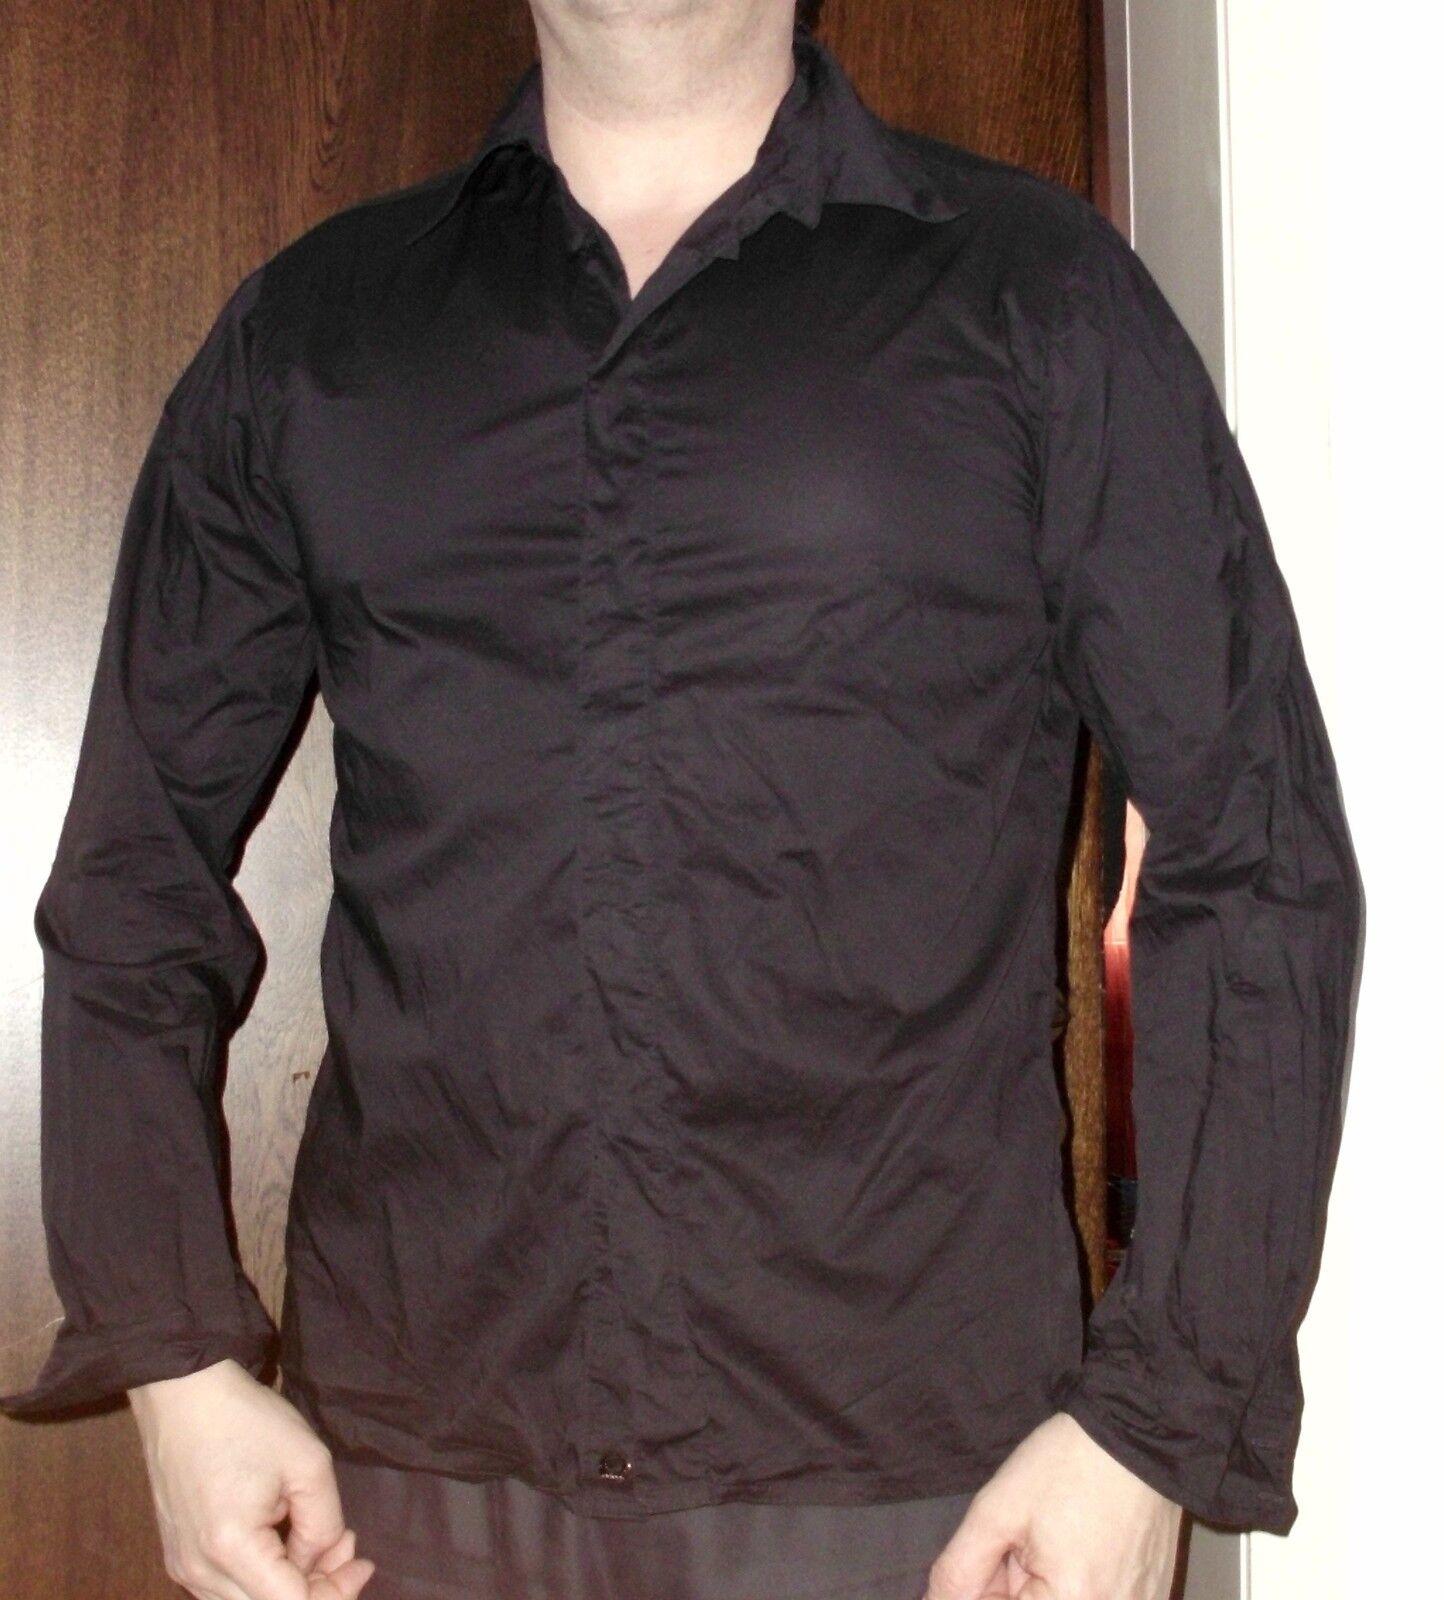 Adidas FISHTAIL SHIRT black Gr. M, Baumwolle, bequem sitzend, langarm